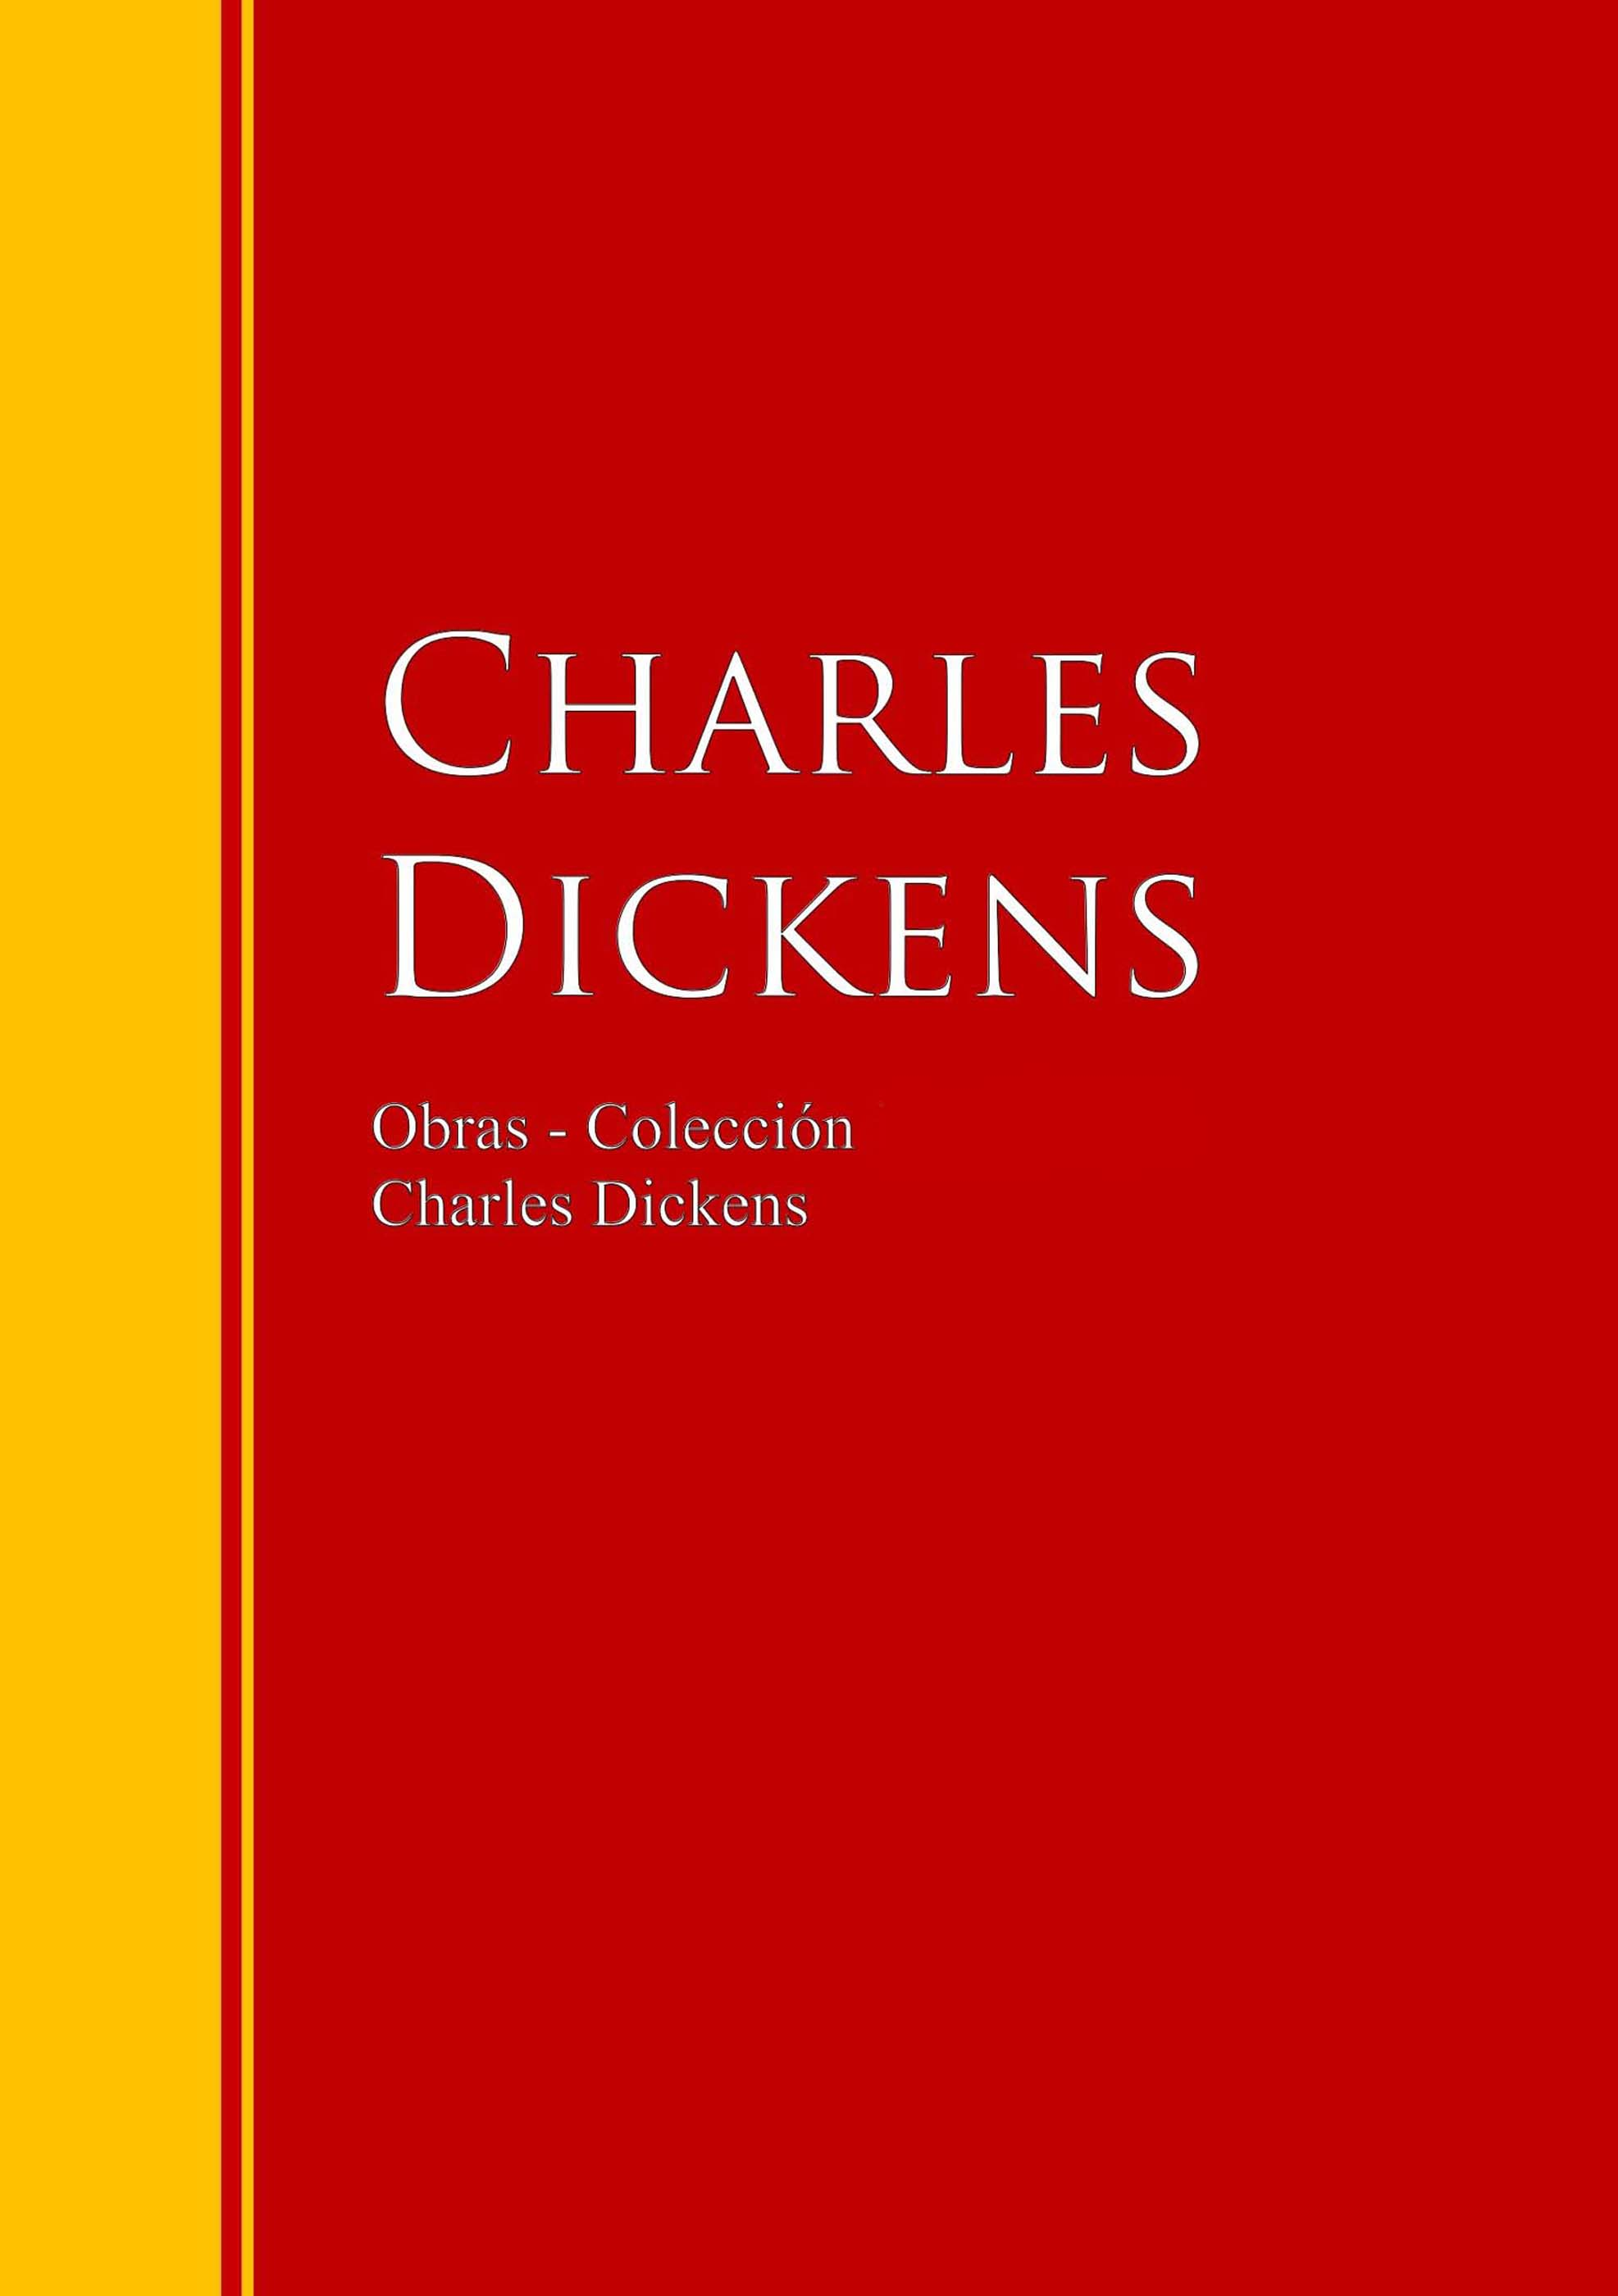 цена Чарльз Диккенс Obras - Colección de Charles Dickens онлайн в 2017 году